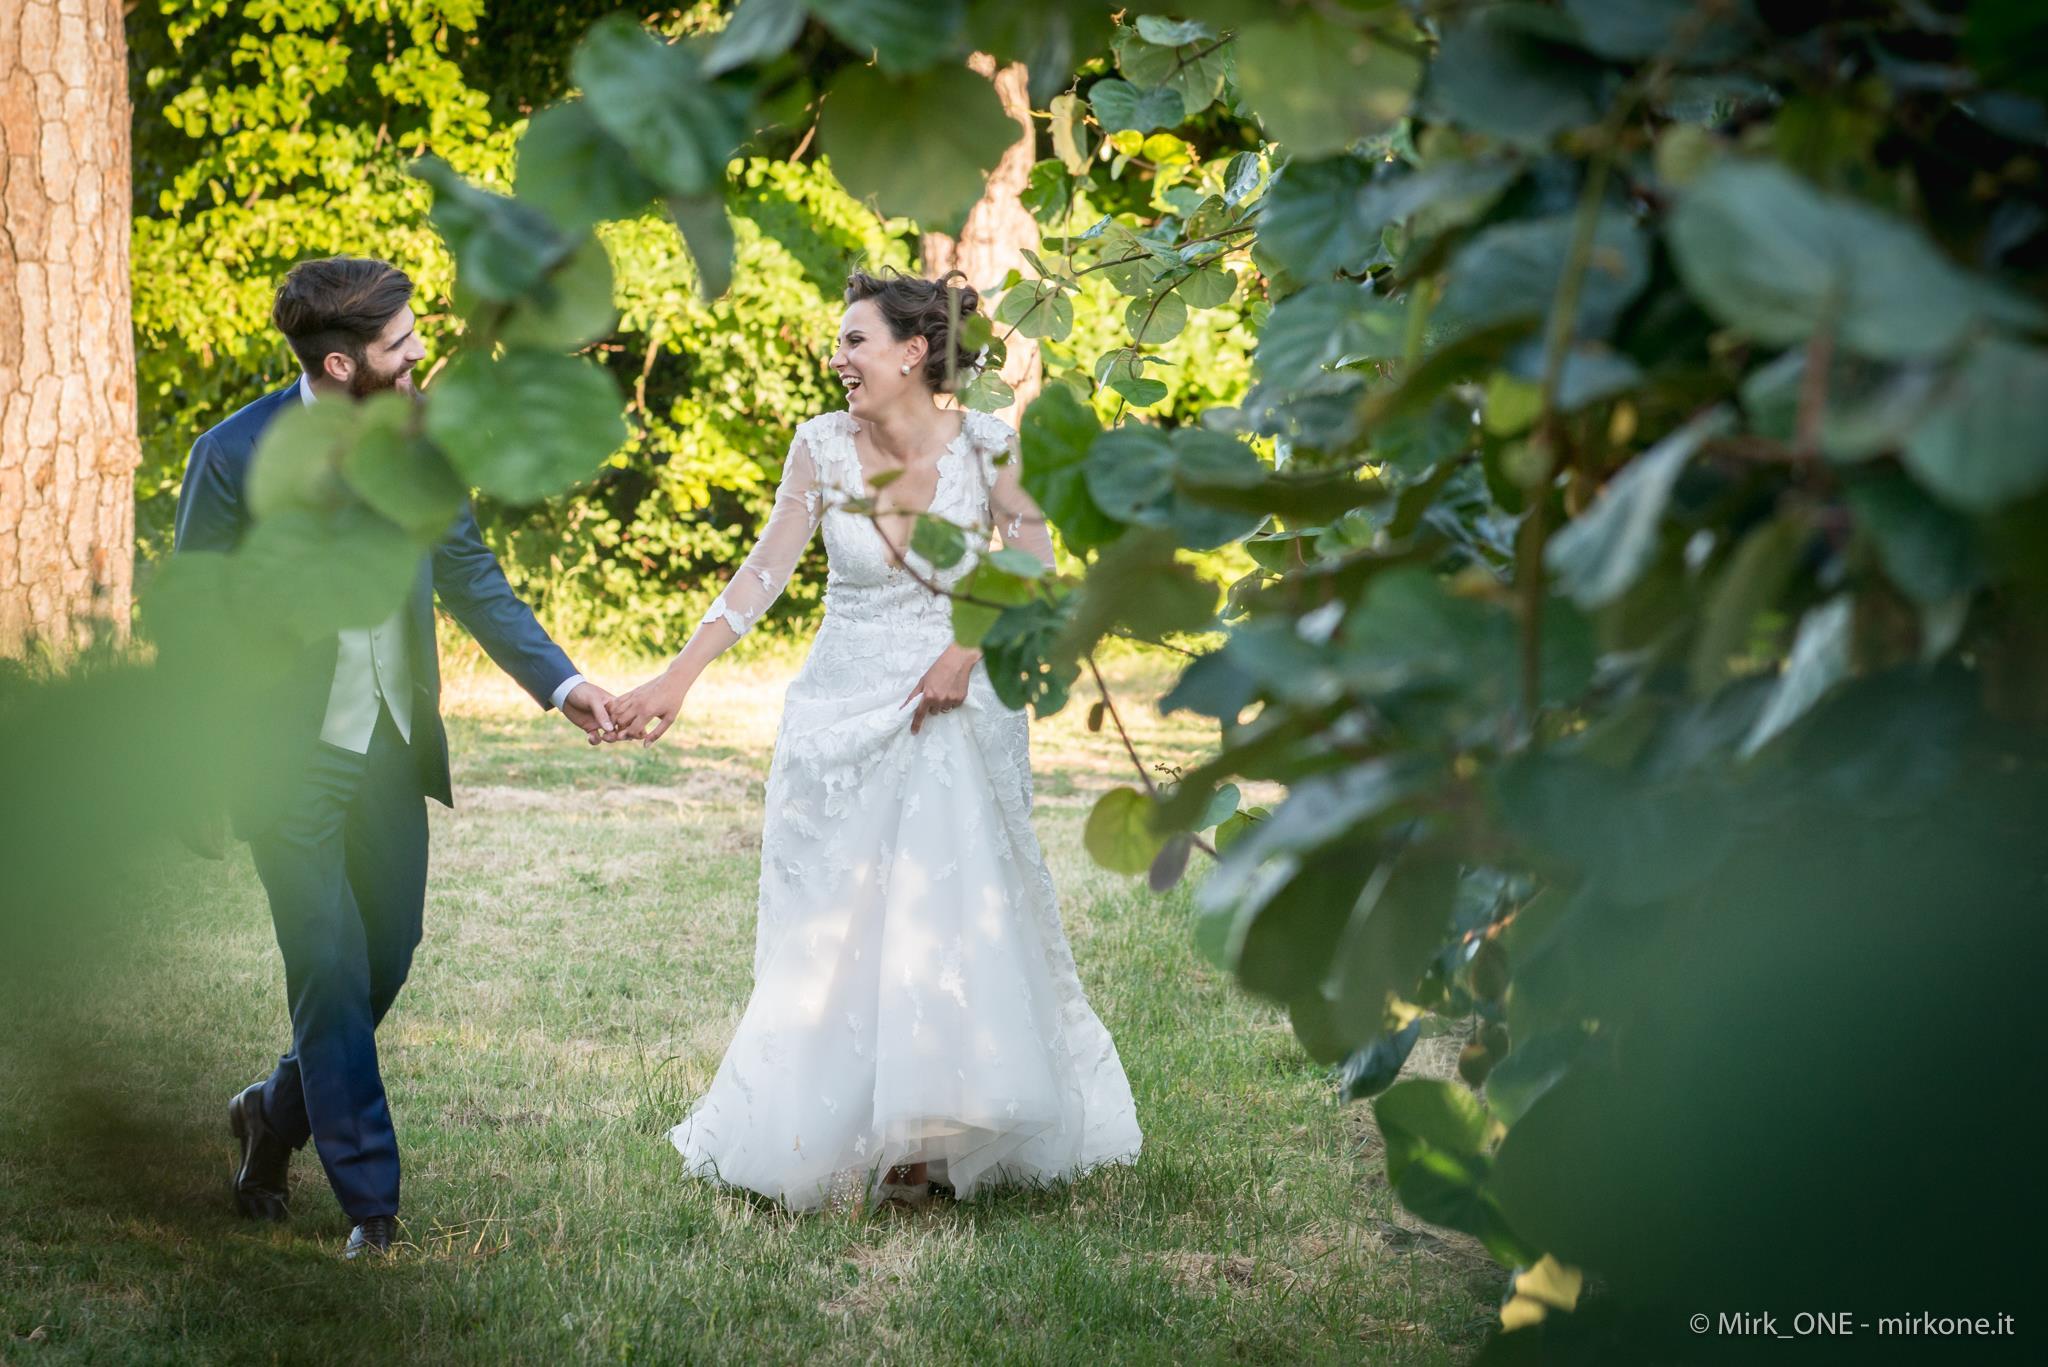 https://lnx.mirkone.it/wp-content/uploads/2015/07/mirk_ONE-fotografo-matrimonio-00105.jpg